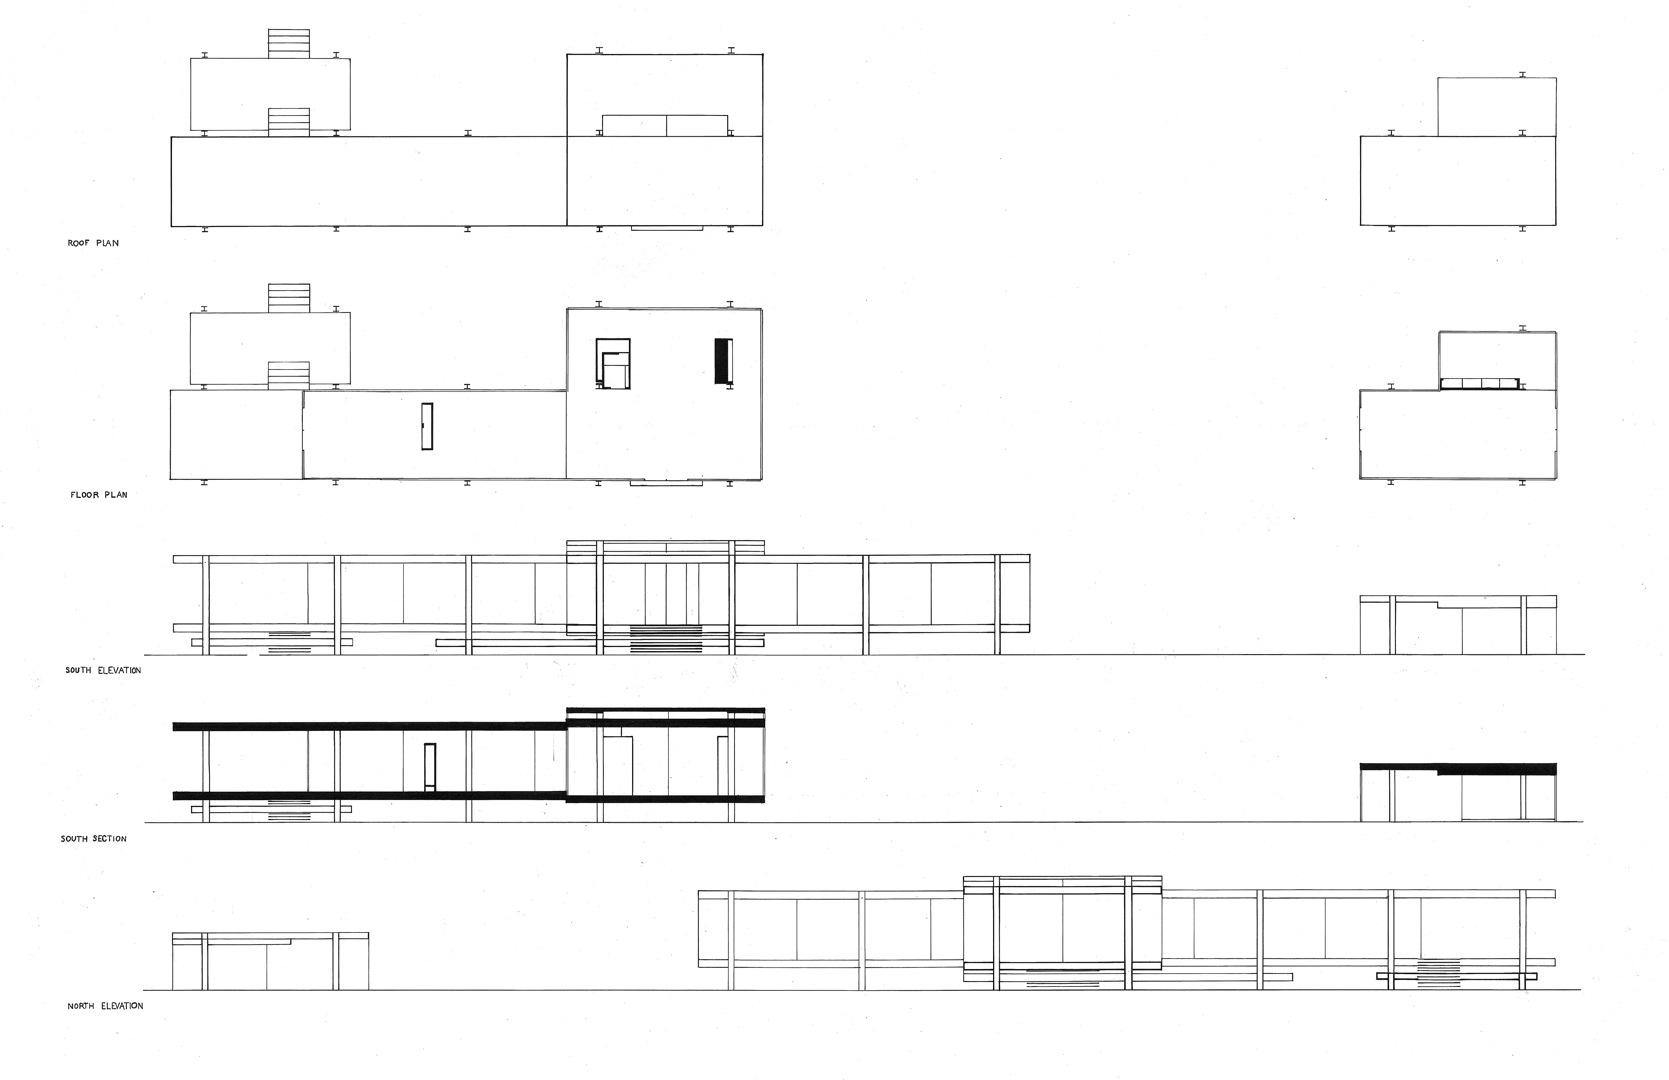 Farnsworth House Addition  Wyatt S Johnson Architecture